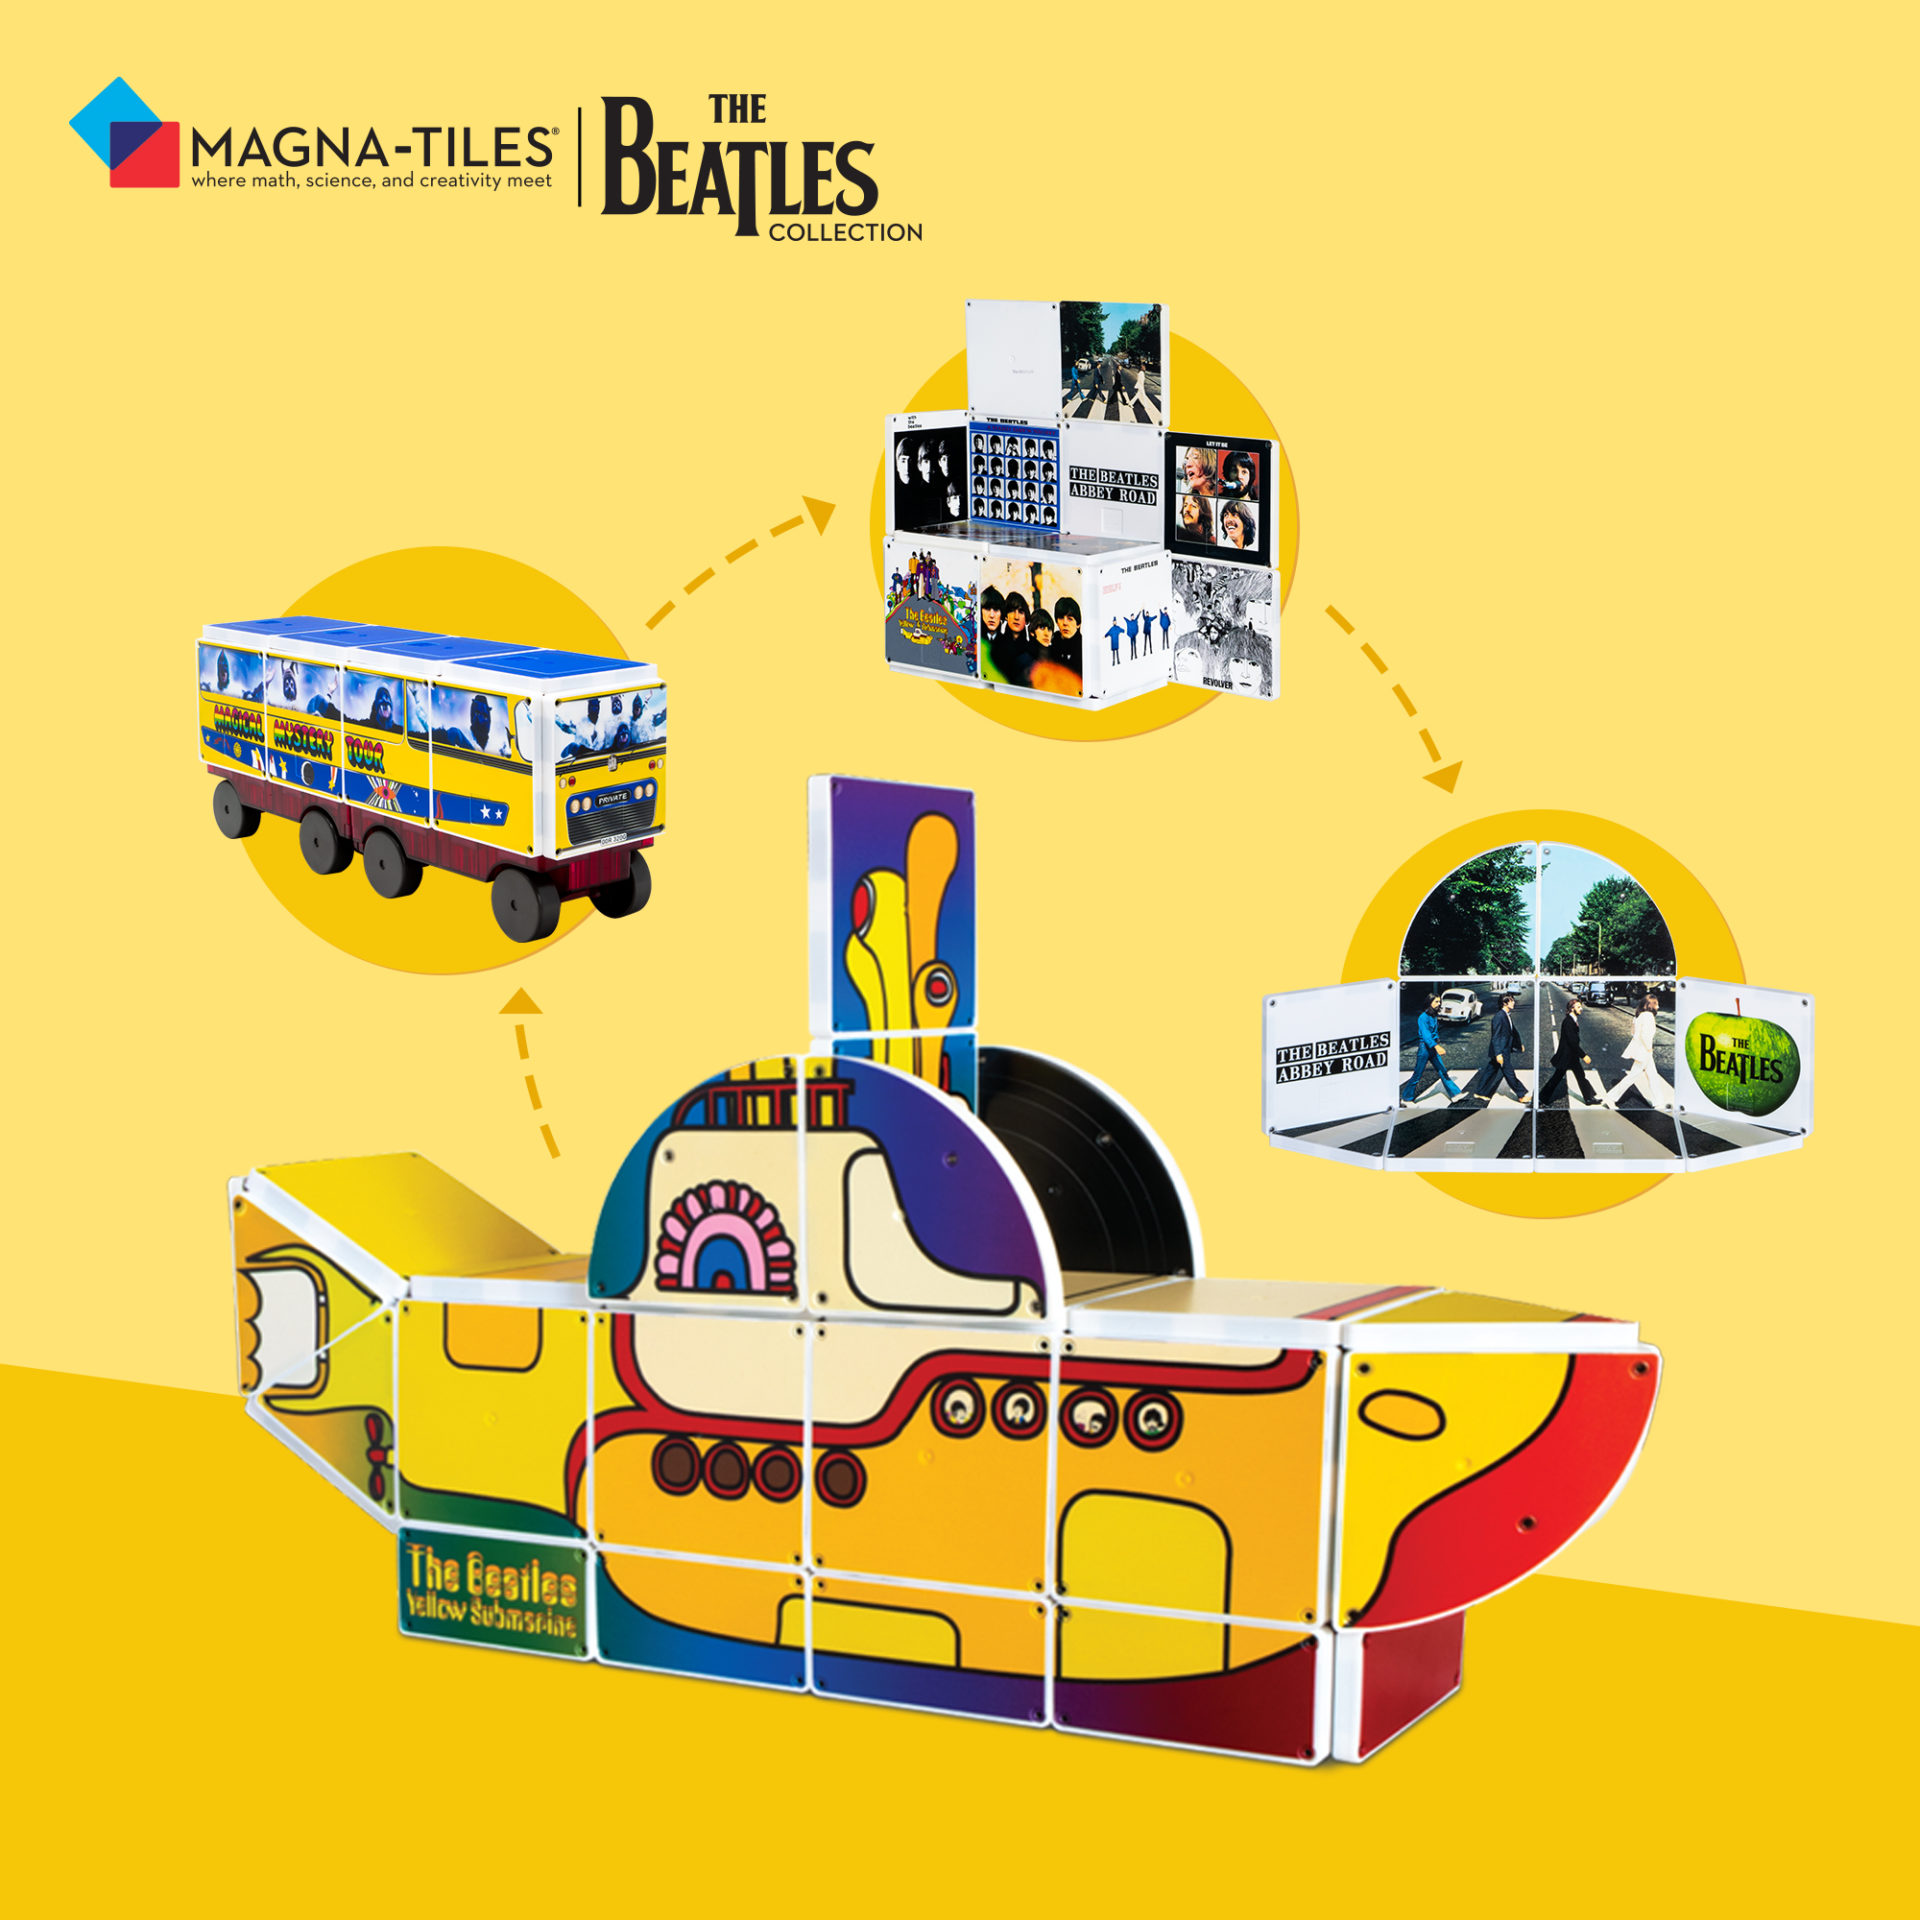 The Beatles Collection Magna-Tiles Set